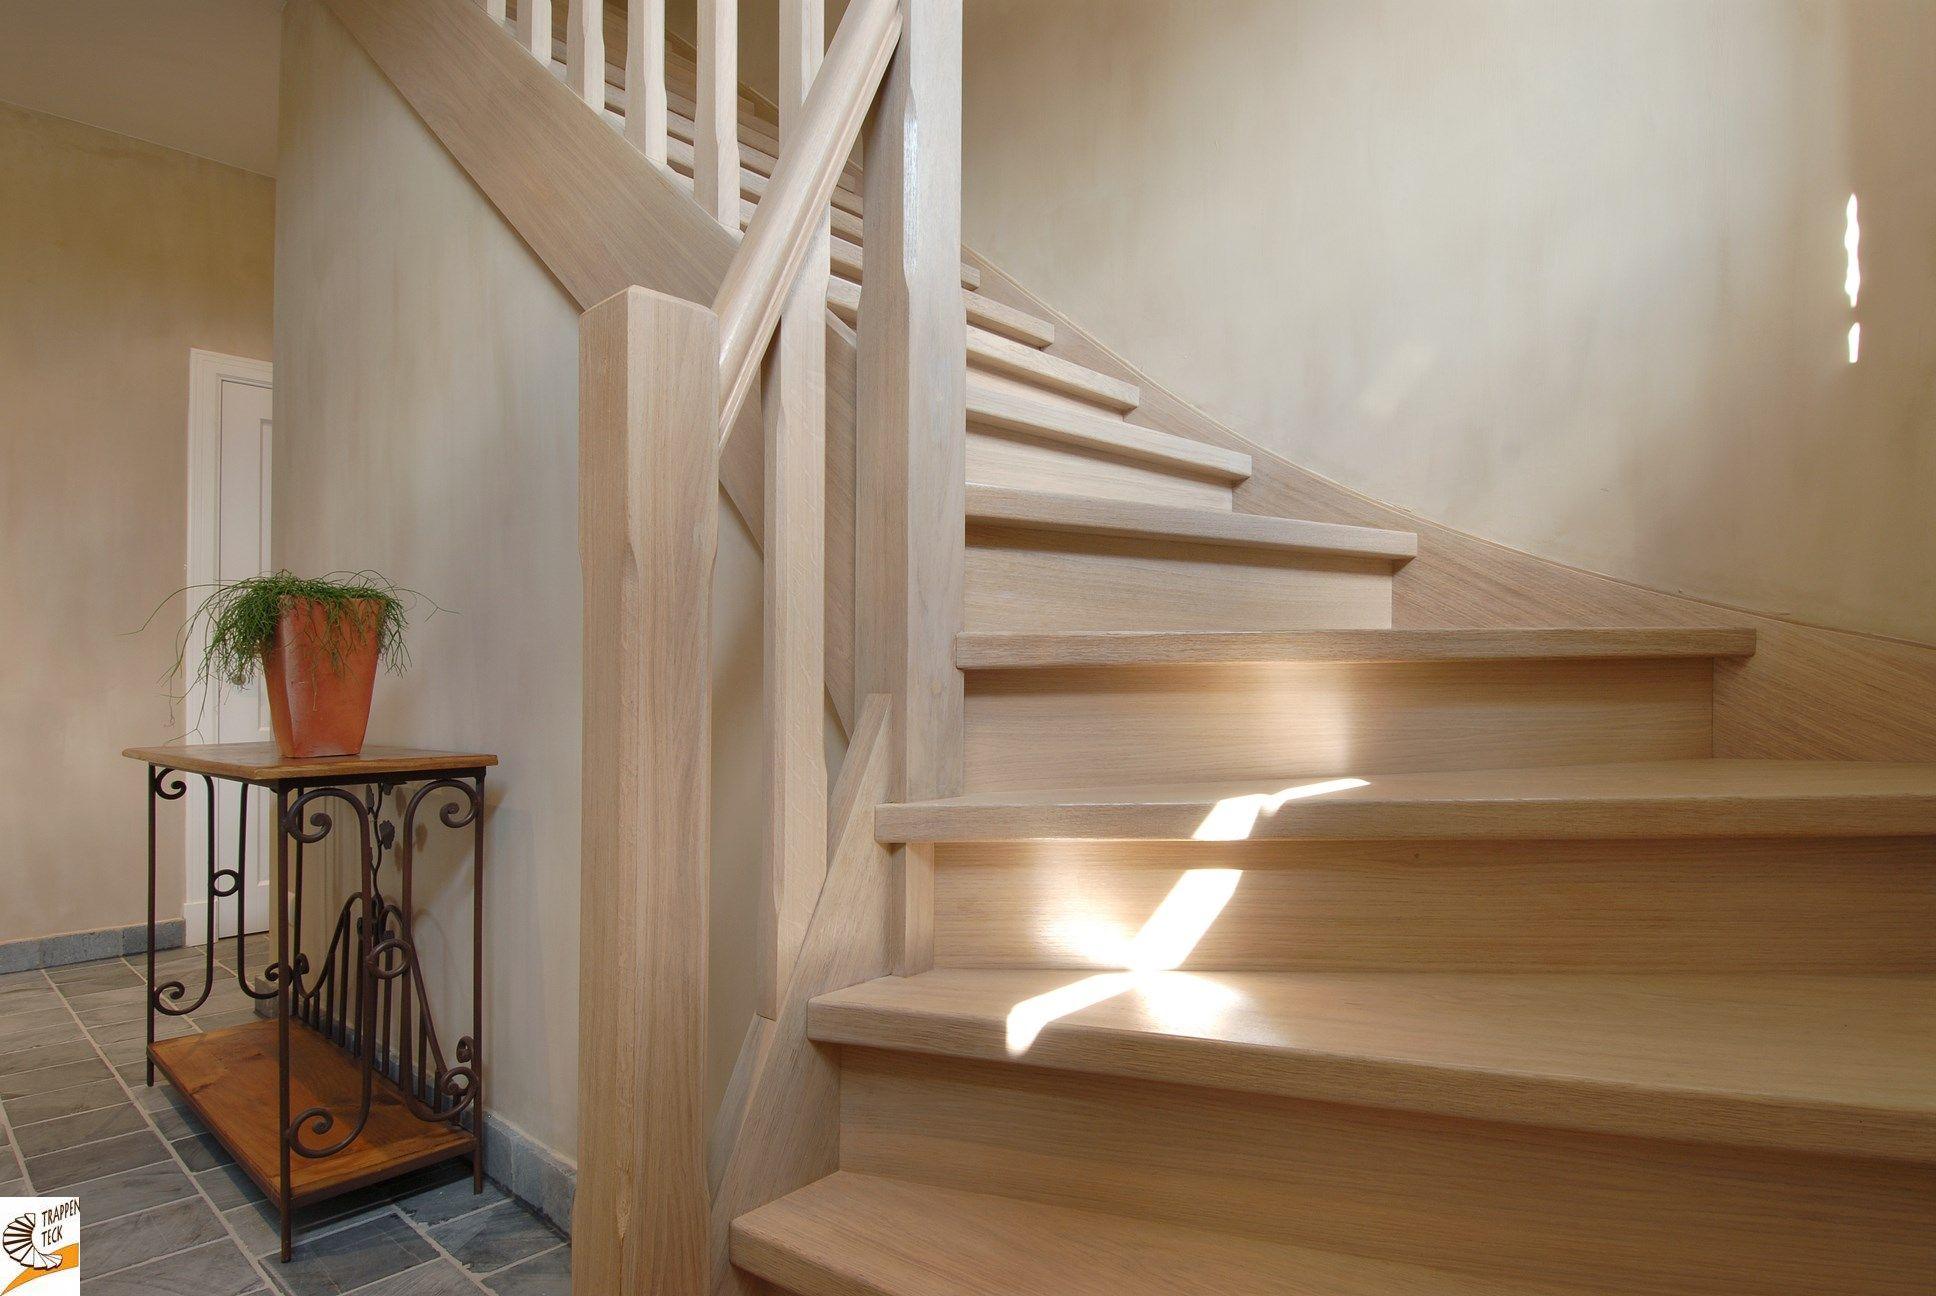 Deco houten trap: houten trap decoratie beste decoratieve ladder